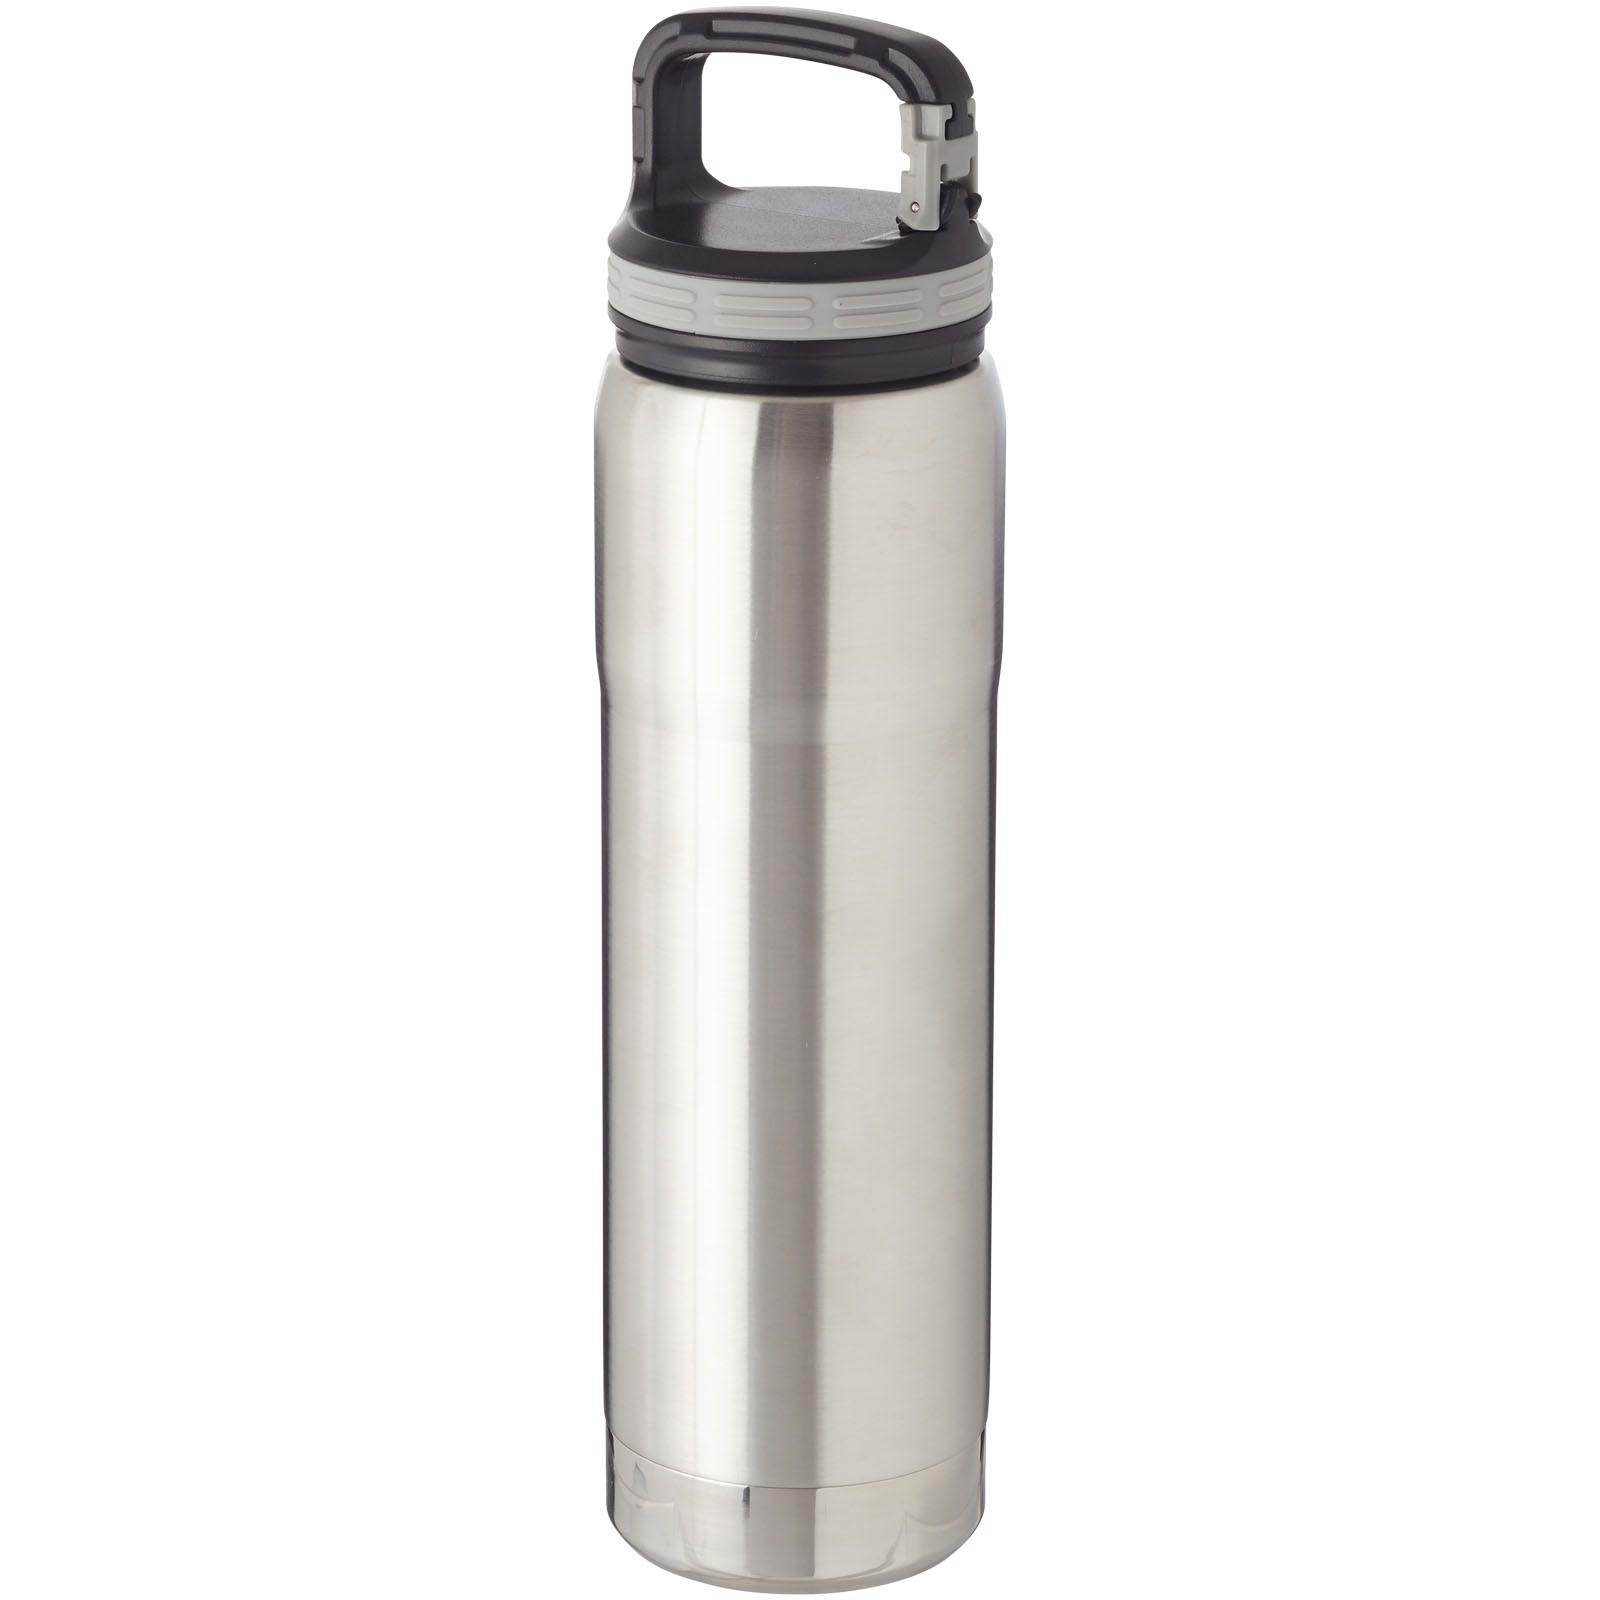 Hemmings 750 ml copper vacuum insulated bottle - Silver